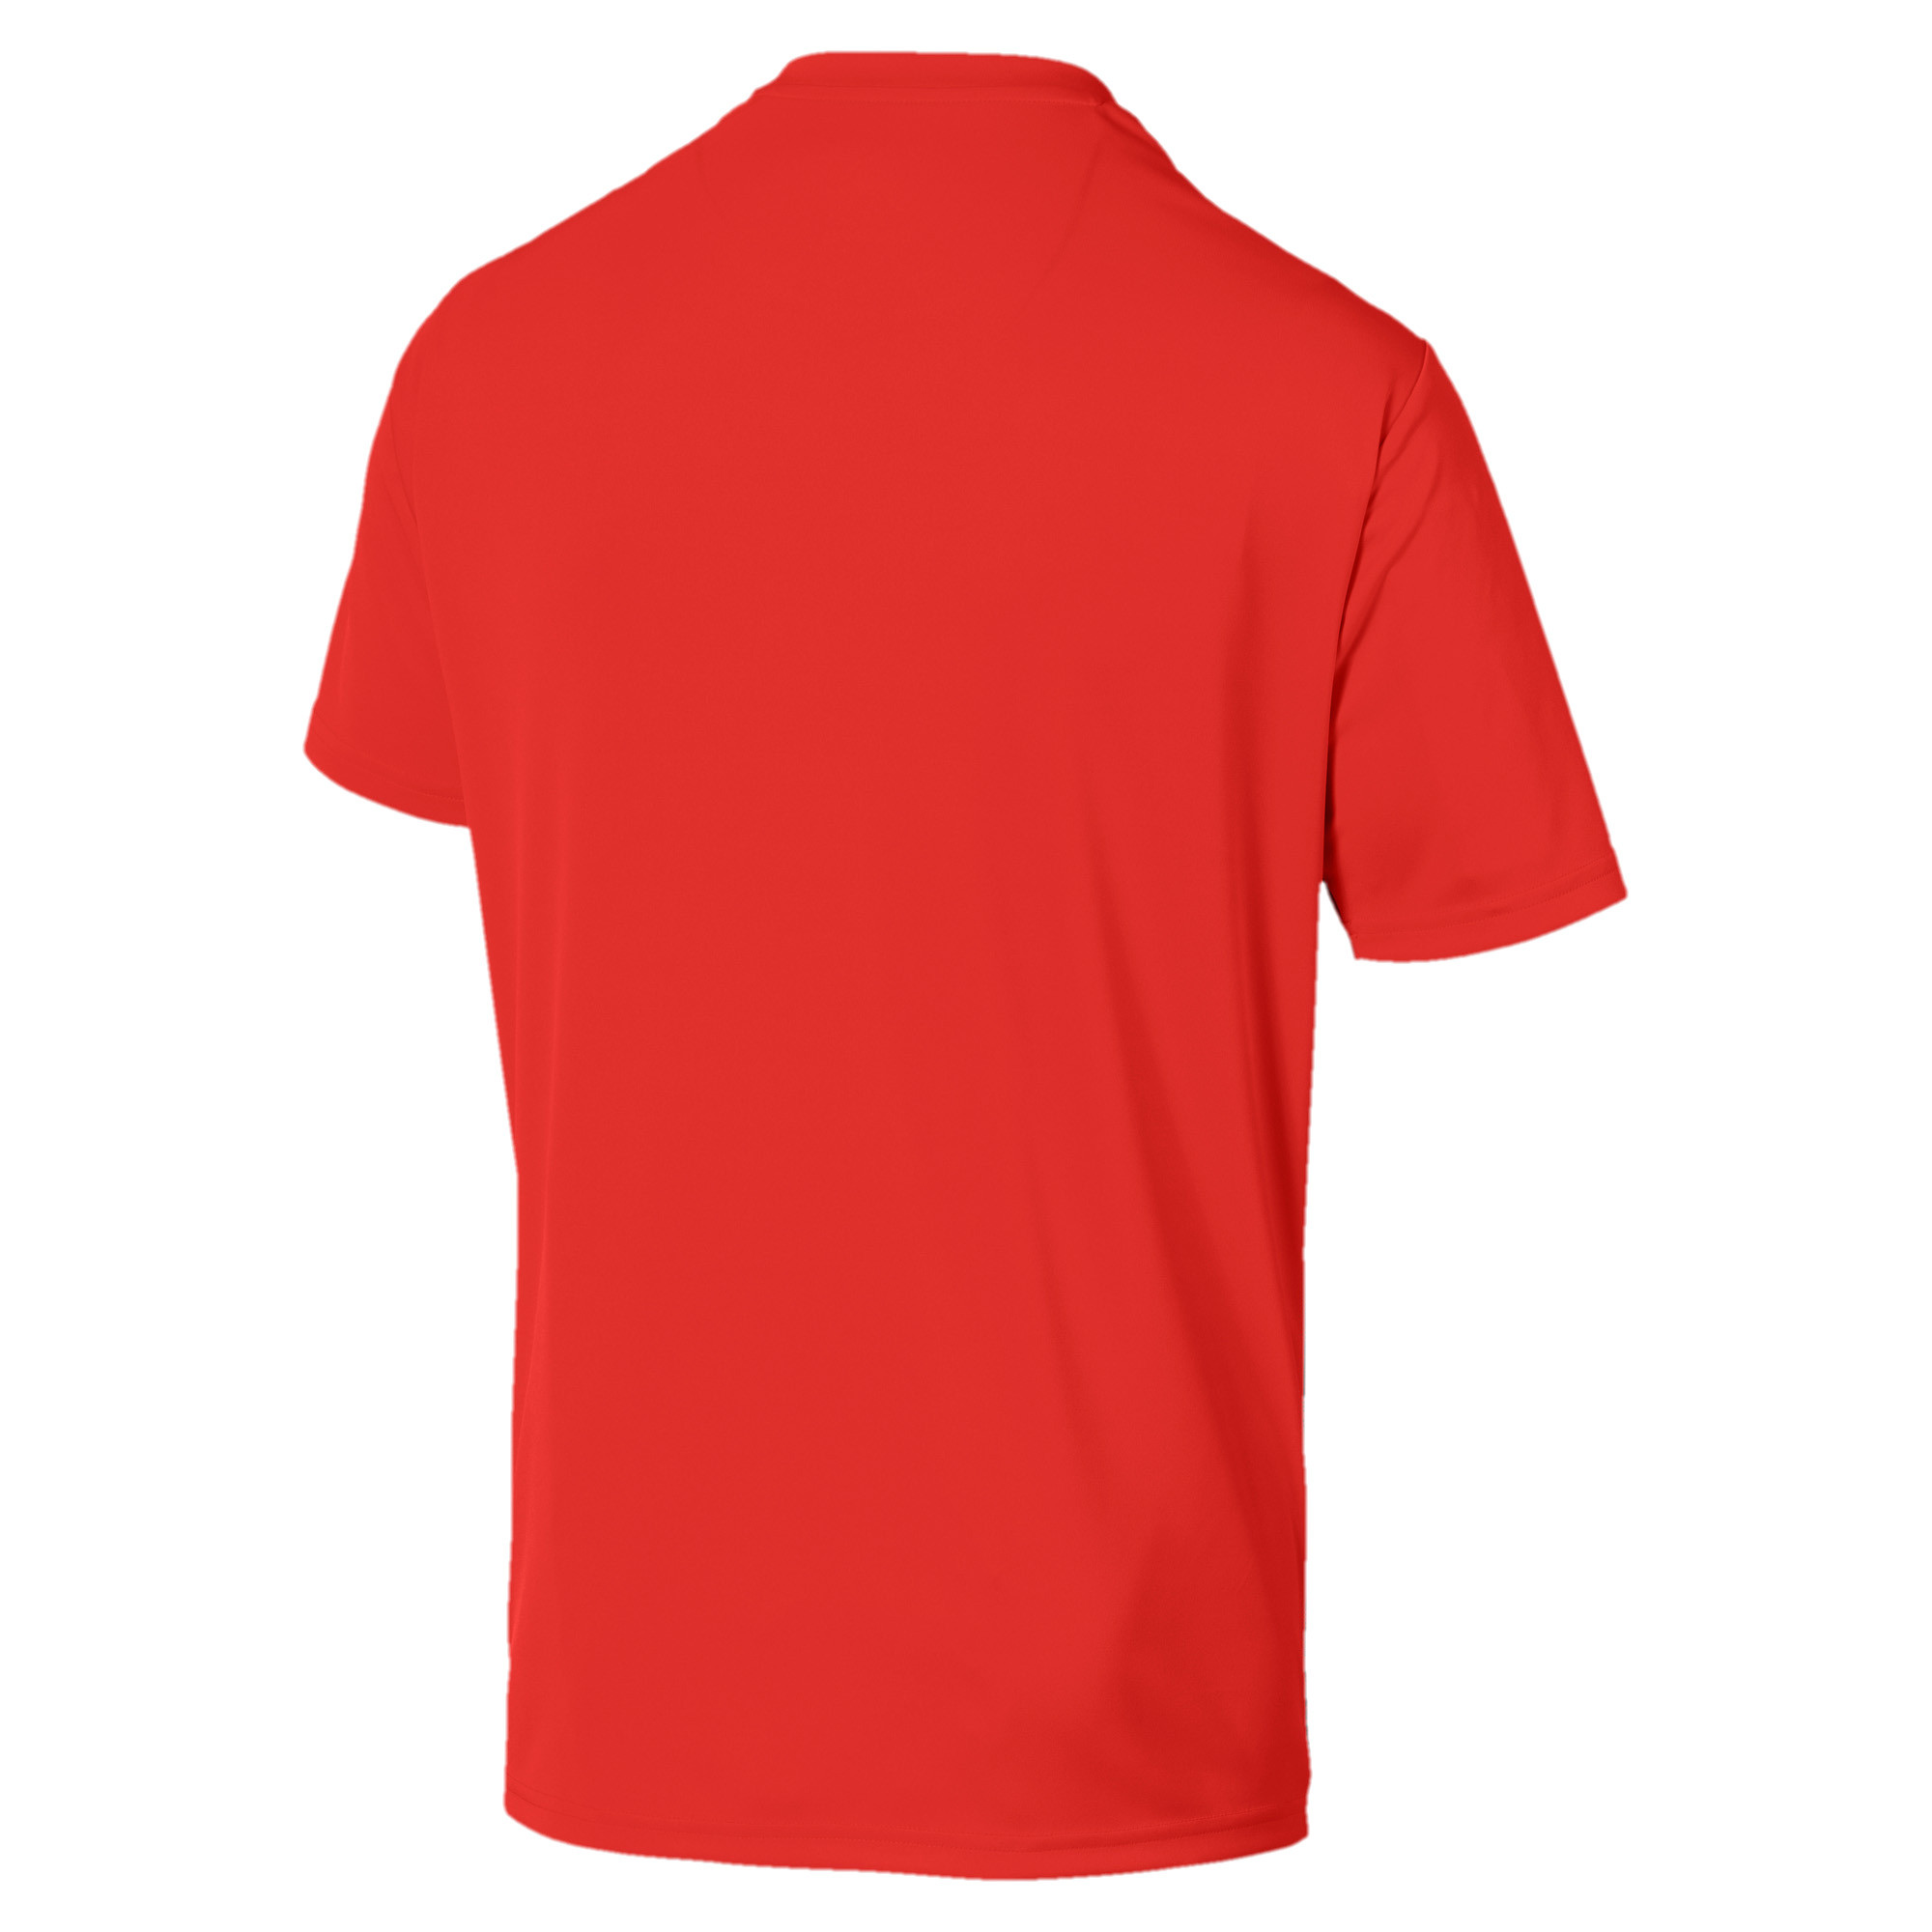 PUMA-ftblNXT-Core-Graphic-Shirt-Men-Tee-Football thumbnail 3